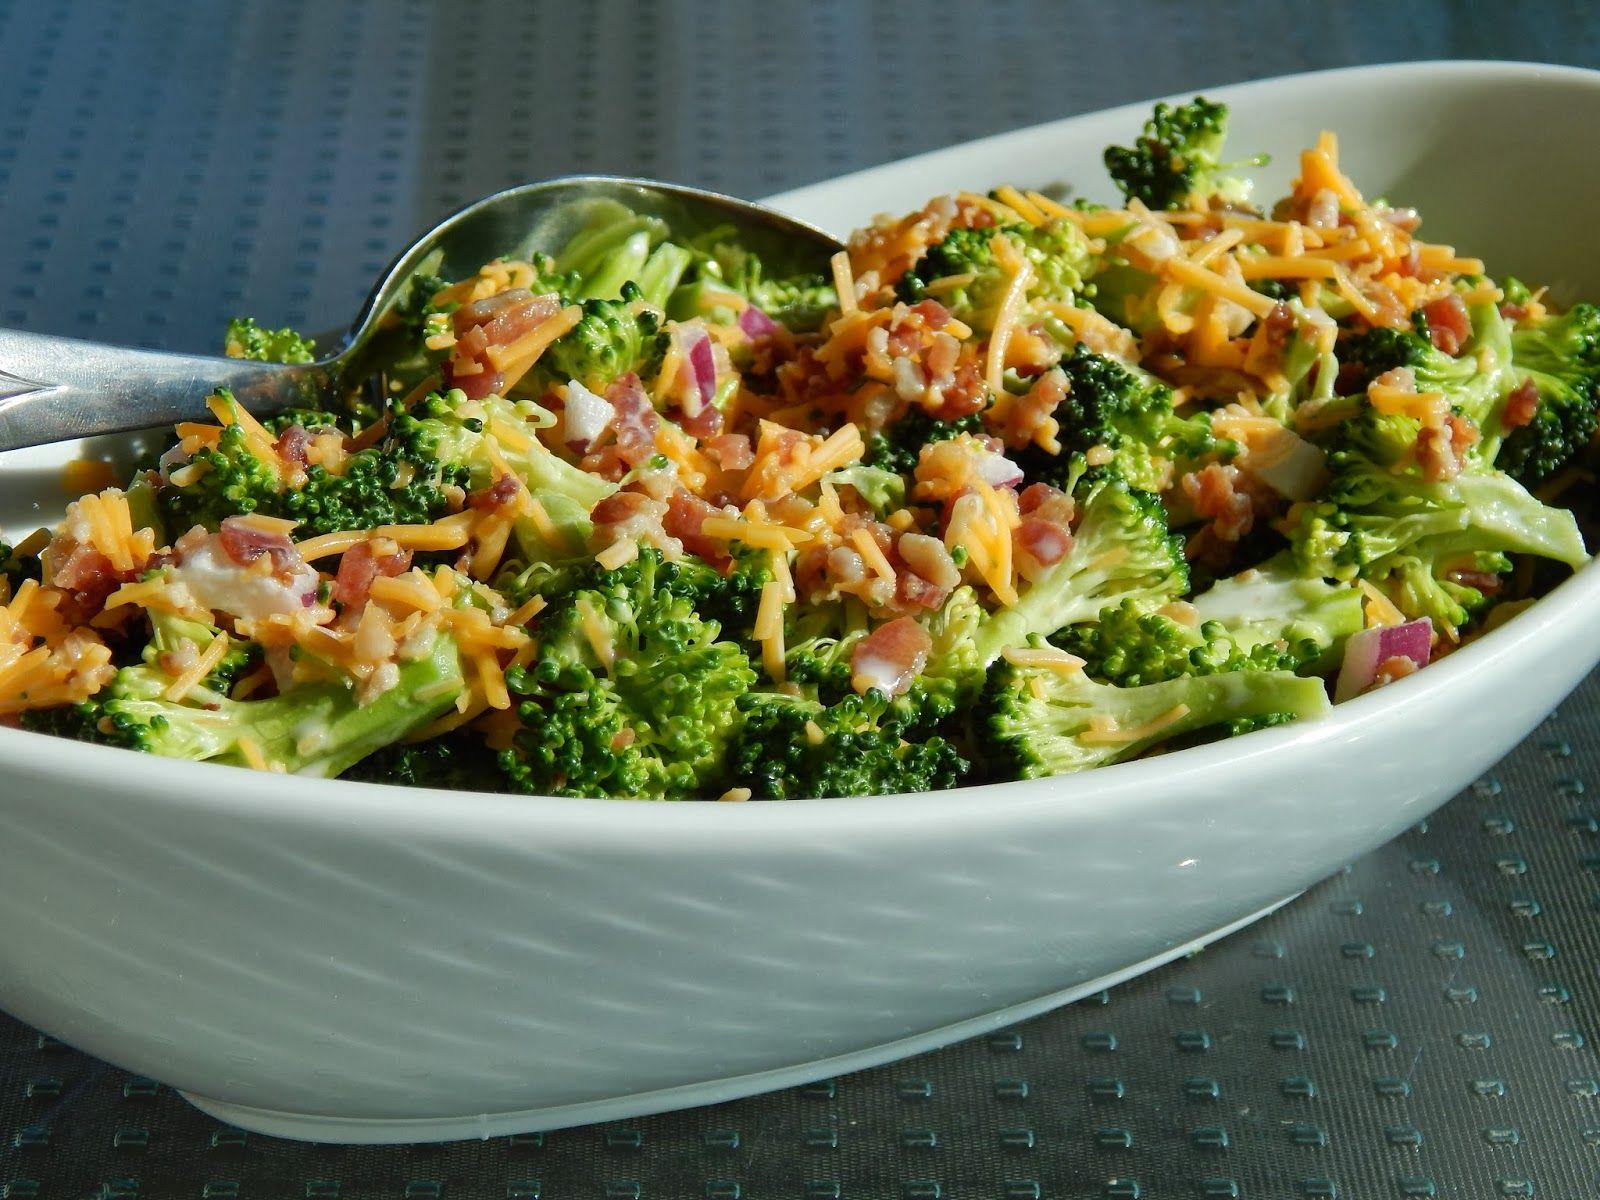 Sweet Amp Tangy Broccoli Salad Recipe Low Carb Sugar